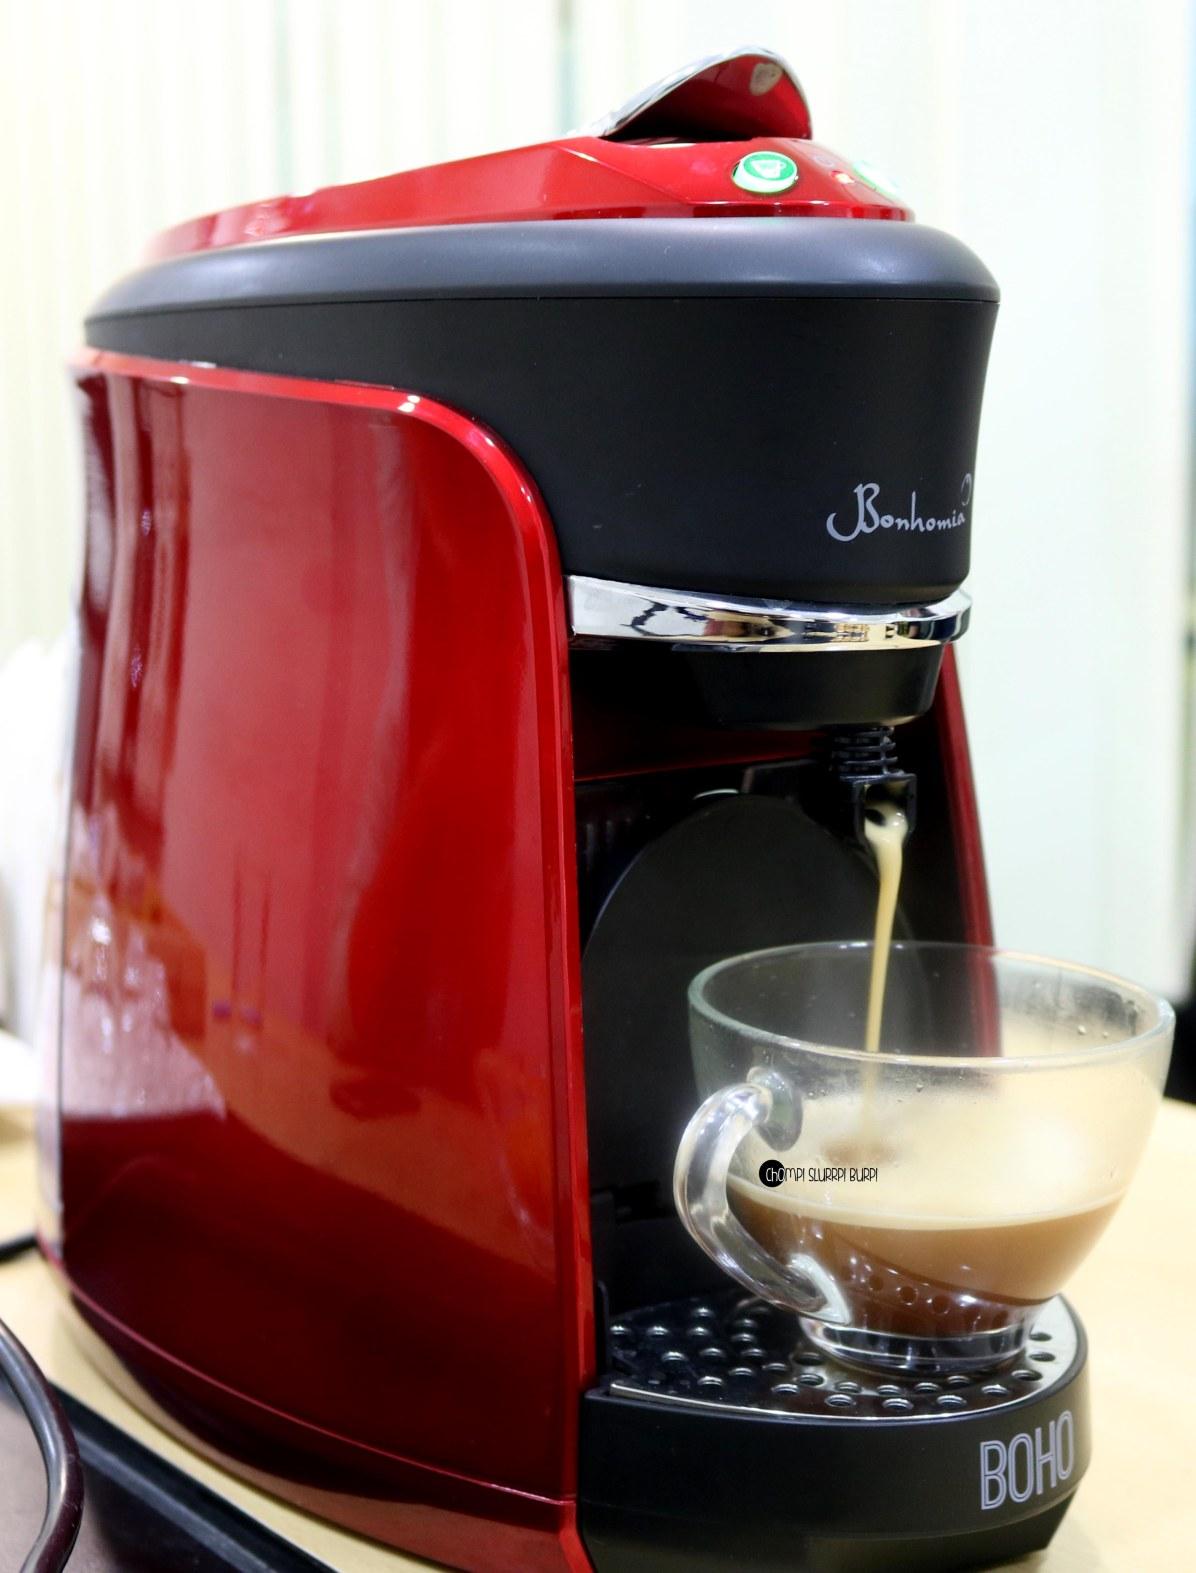 Boho coffee machine